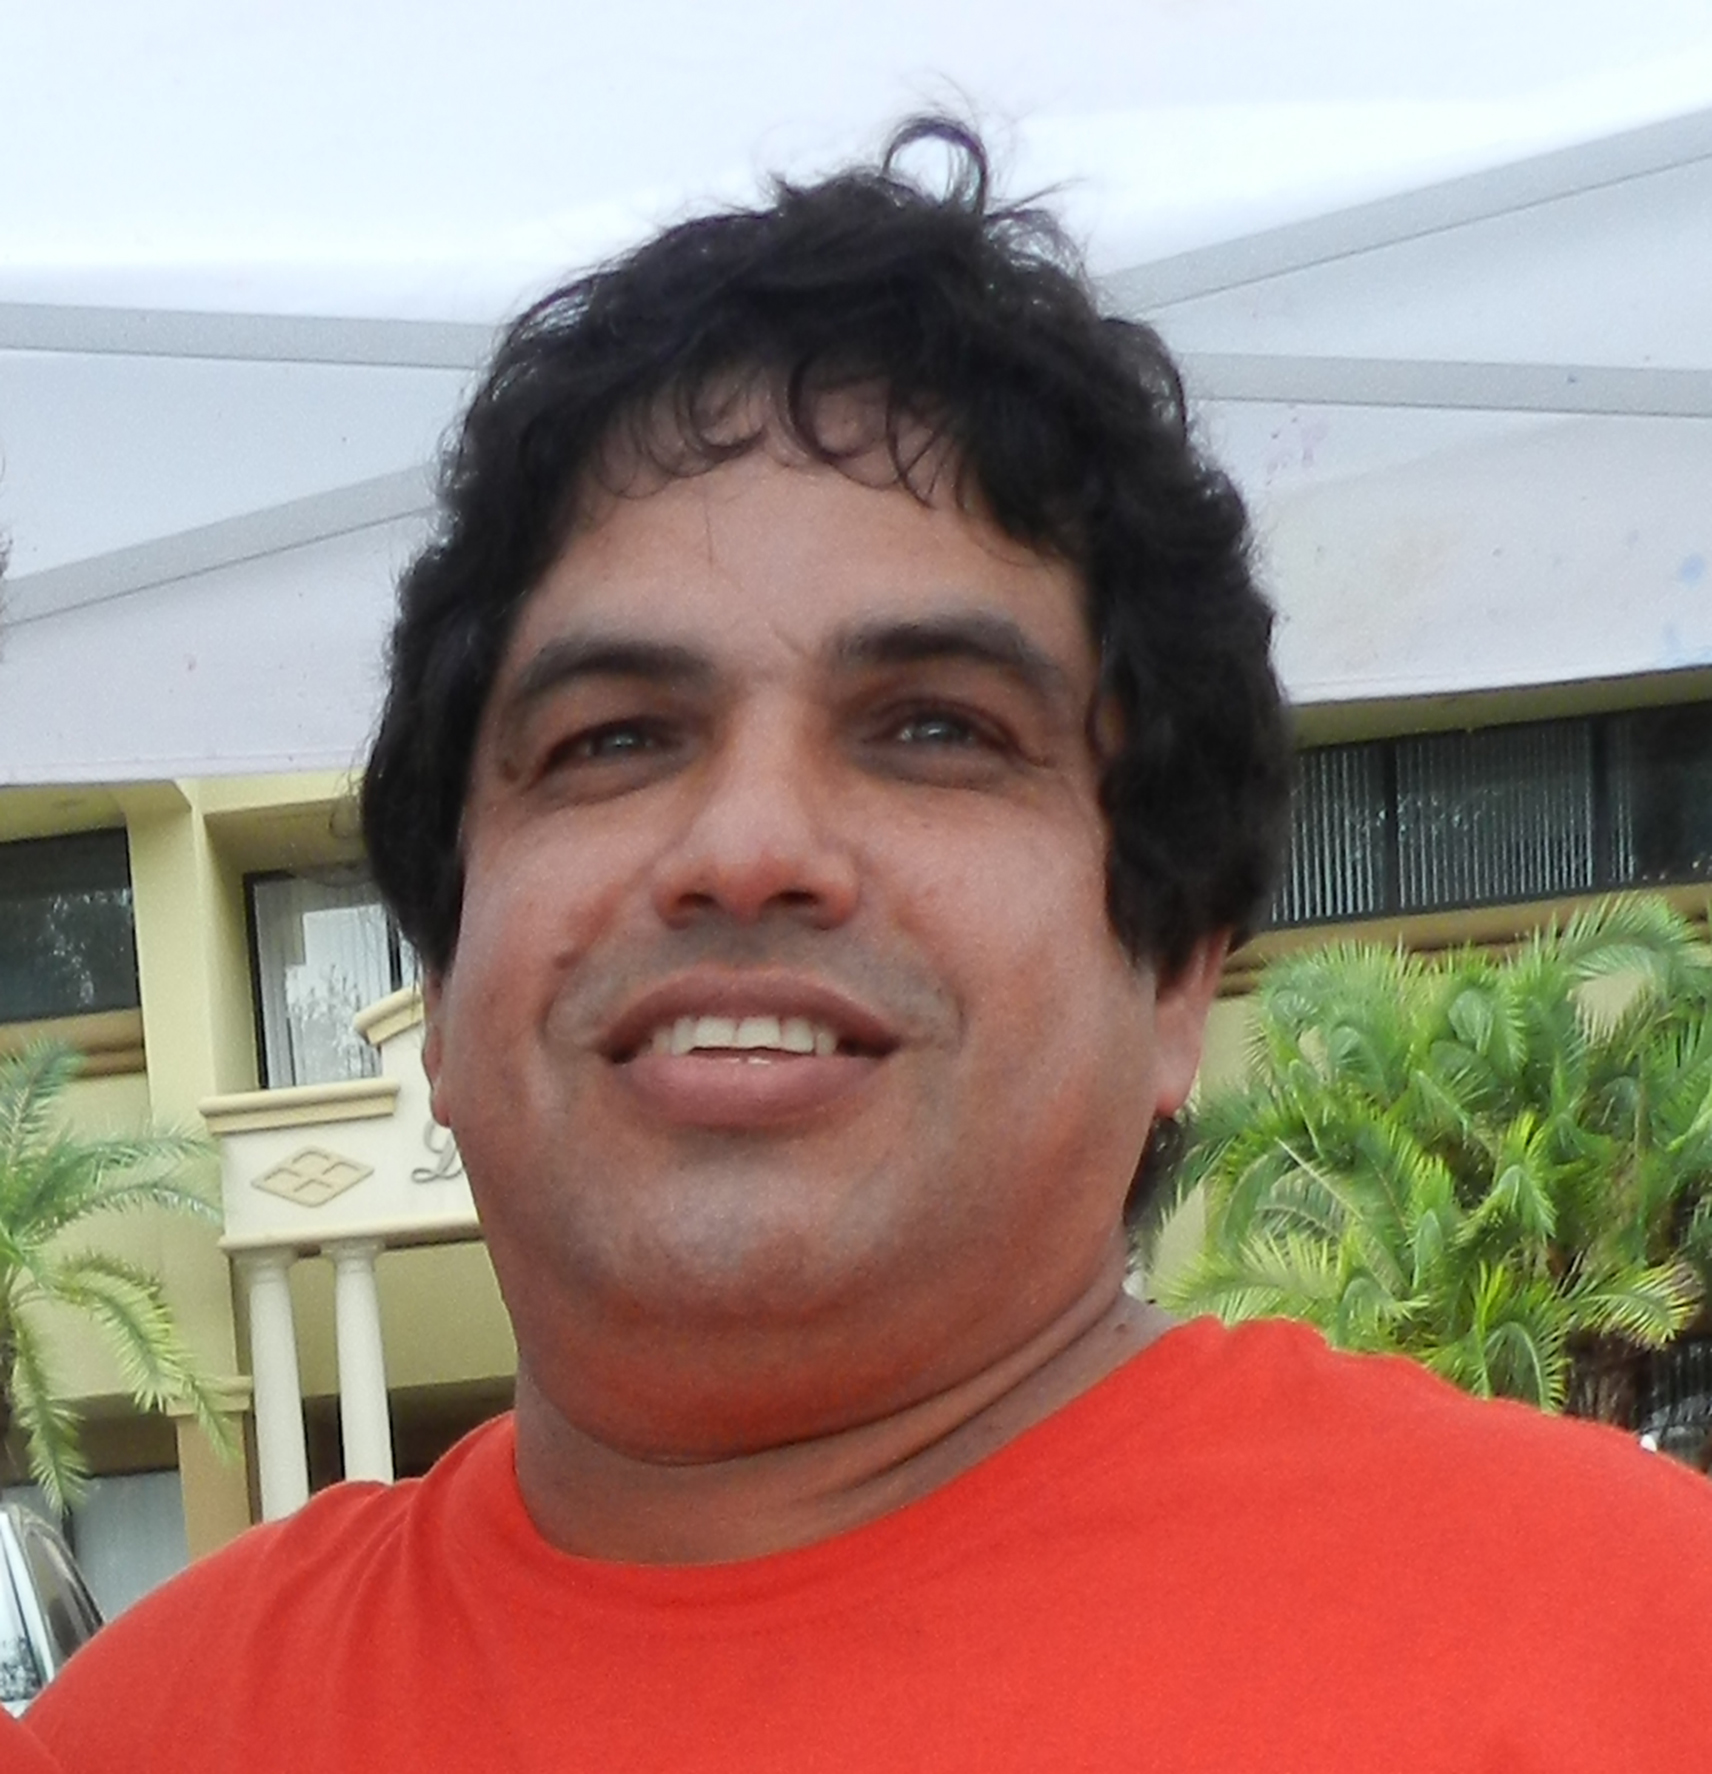 José_Lugo_(Artesano_Madera_1)